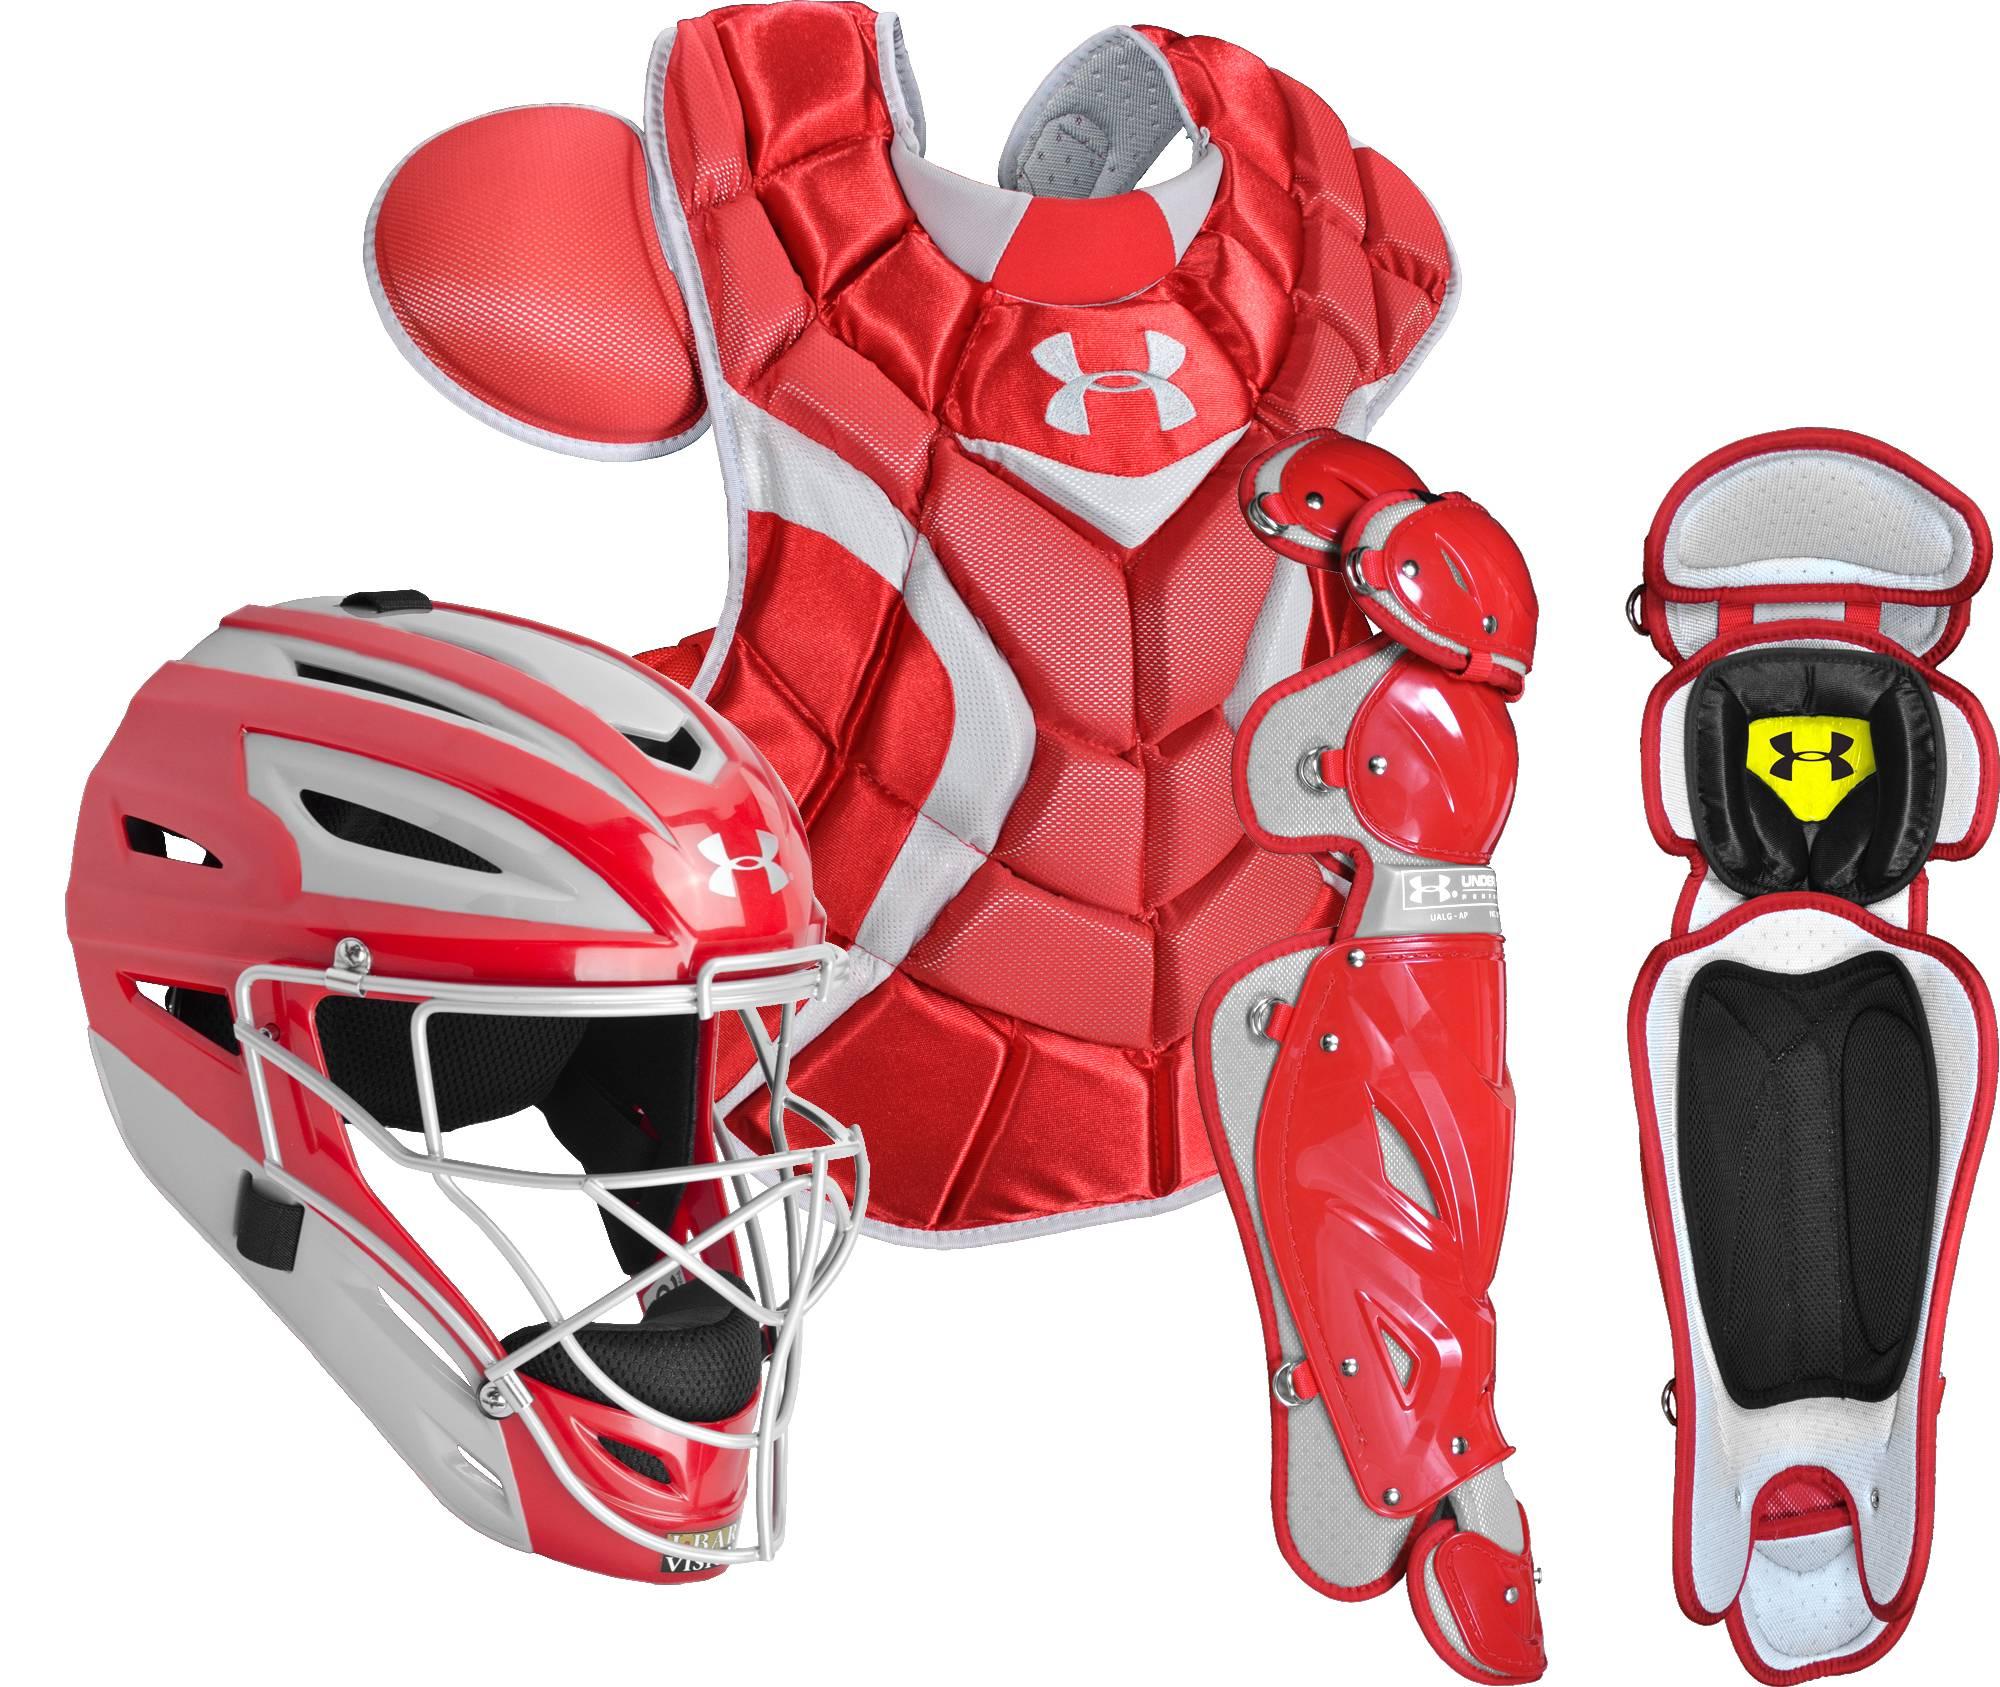 Home Design Outlet Center Chicago Under Armour Adult Pro Baseball Catcher S Gear Set